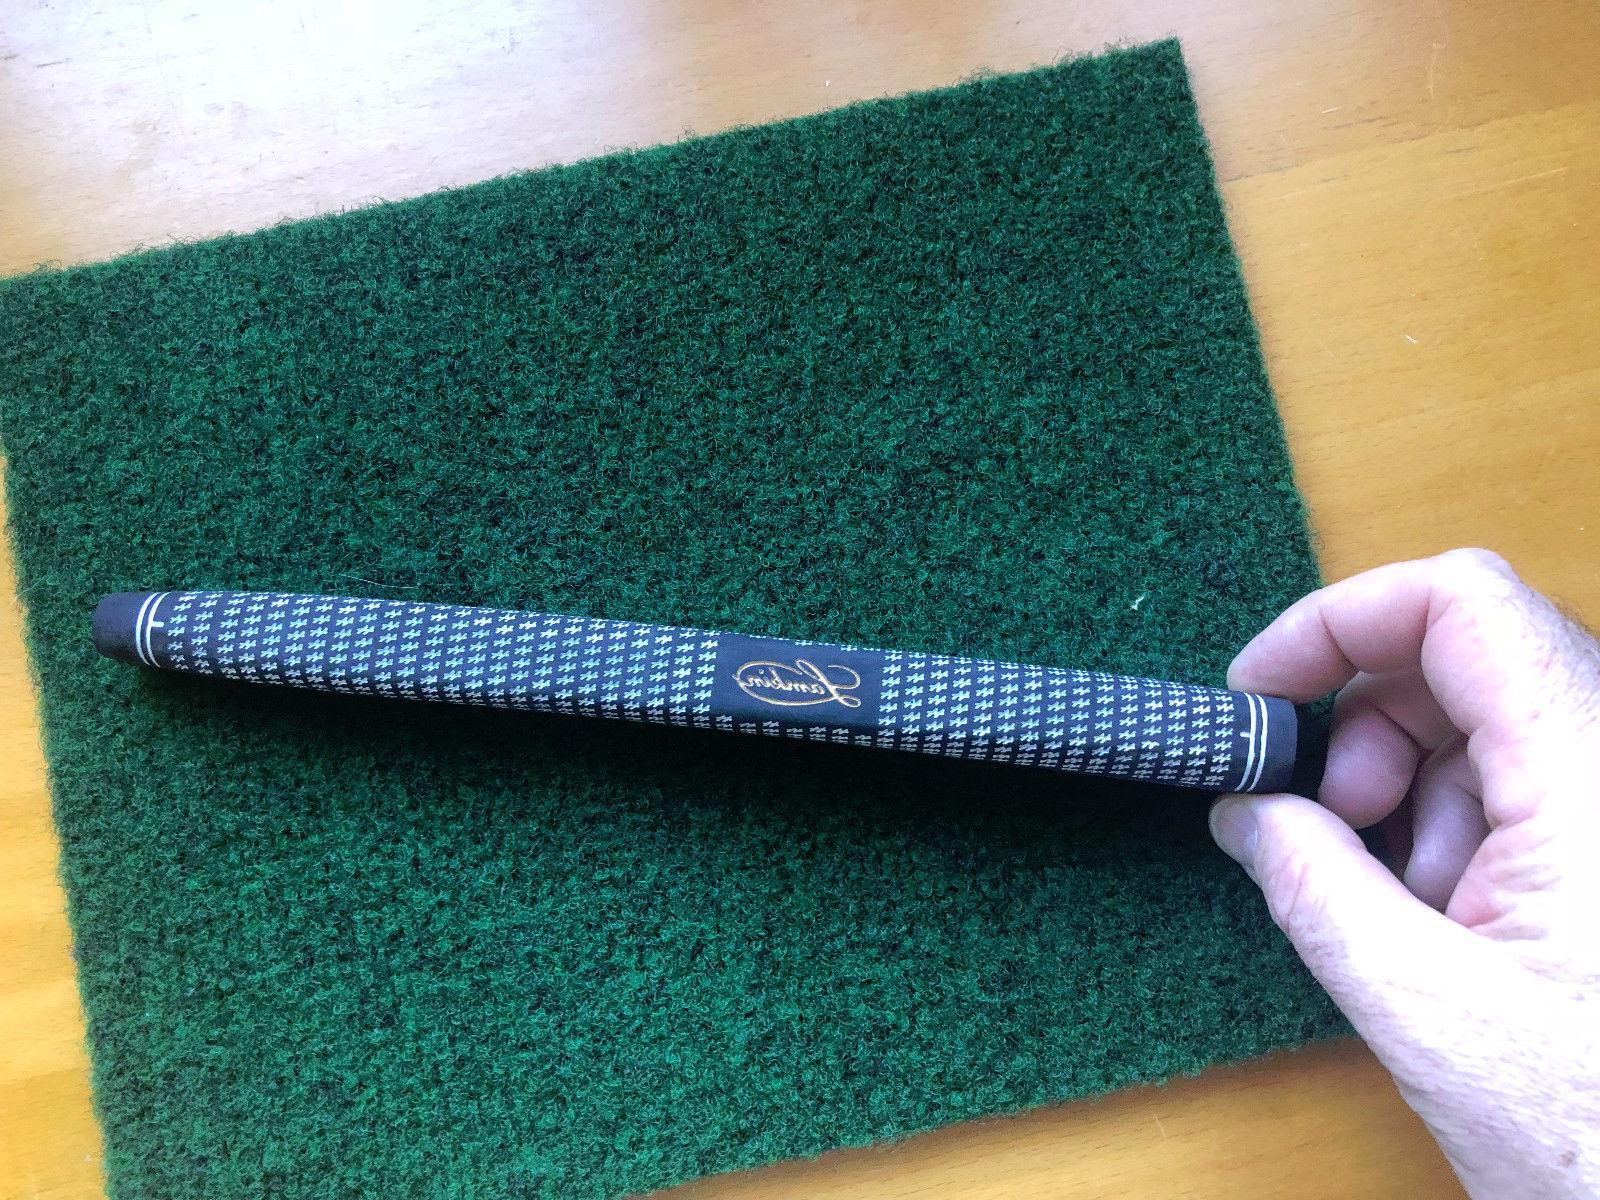 new single crossline paddle putter grips black